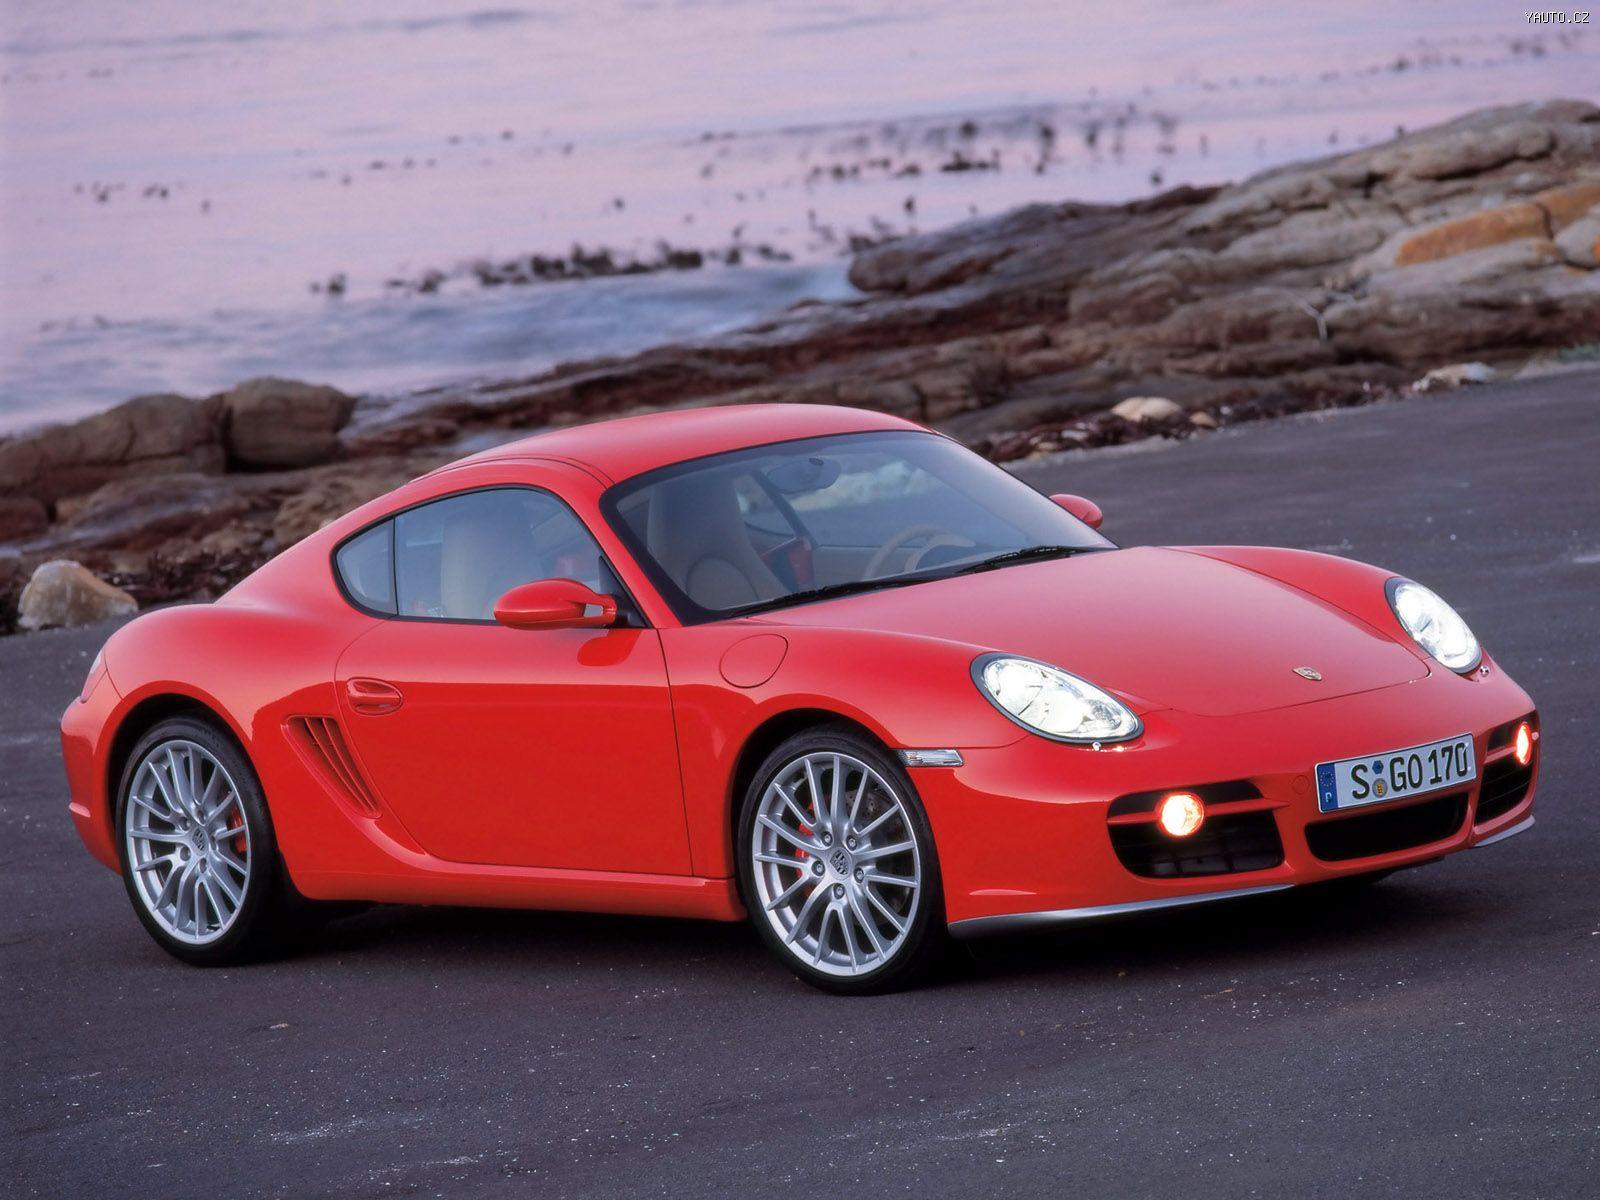 Porsche Cayman S 2005 Auta Na Plochu Tapety Na Plochu Wallpapers